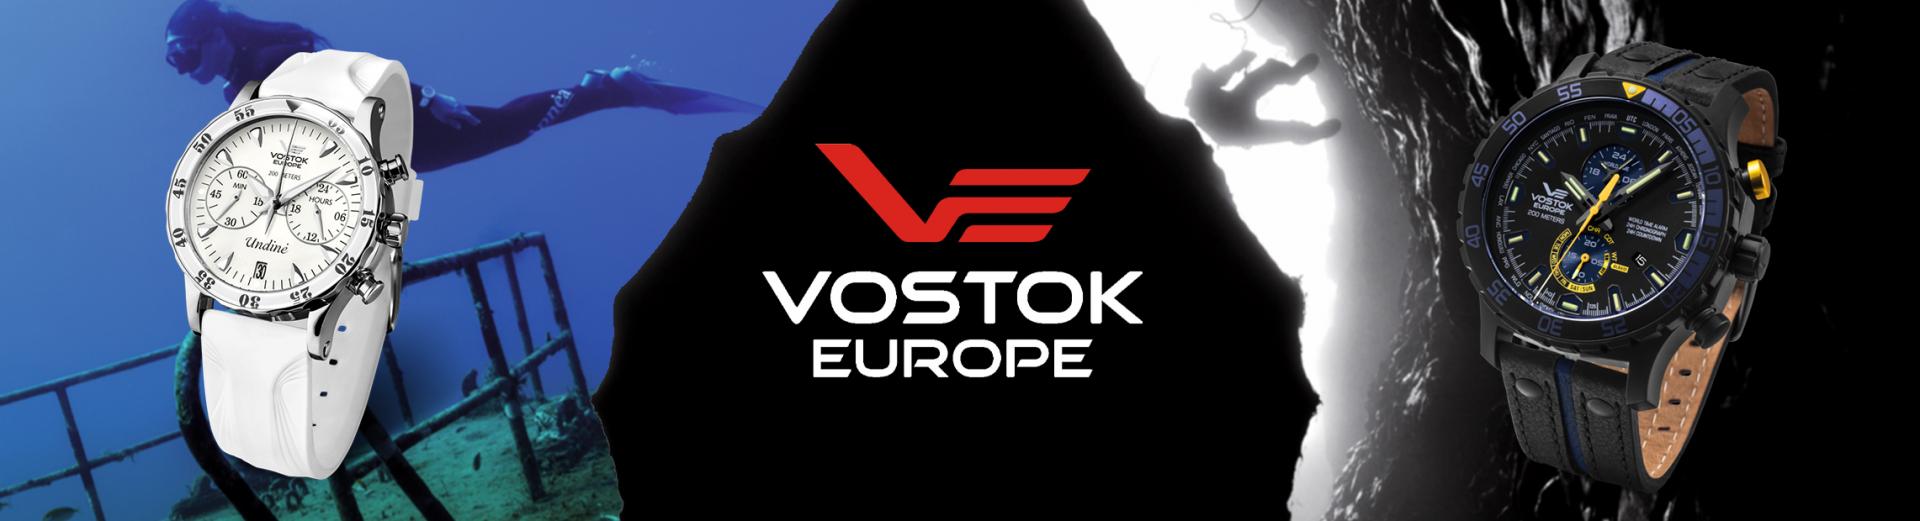 vostok-europe-satovi-kliklak